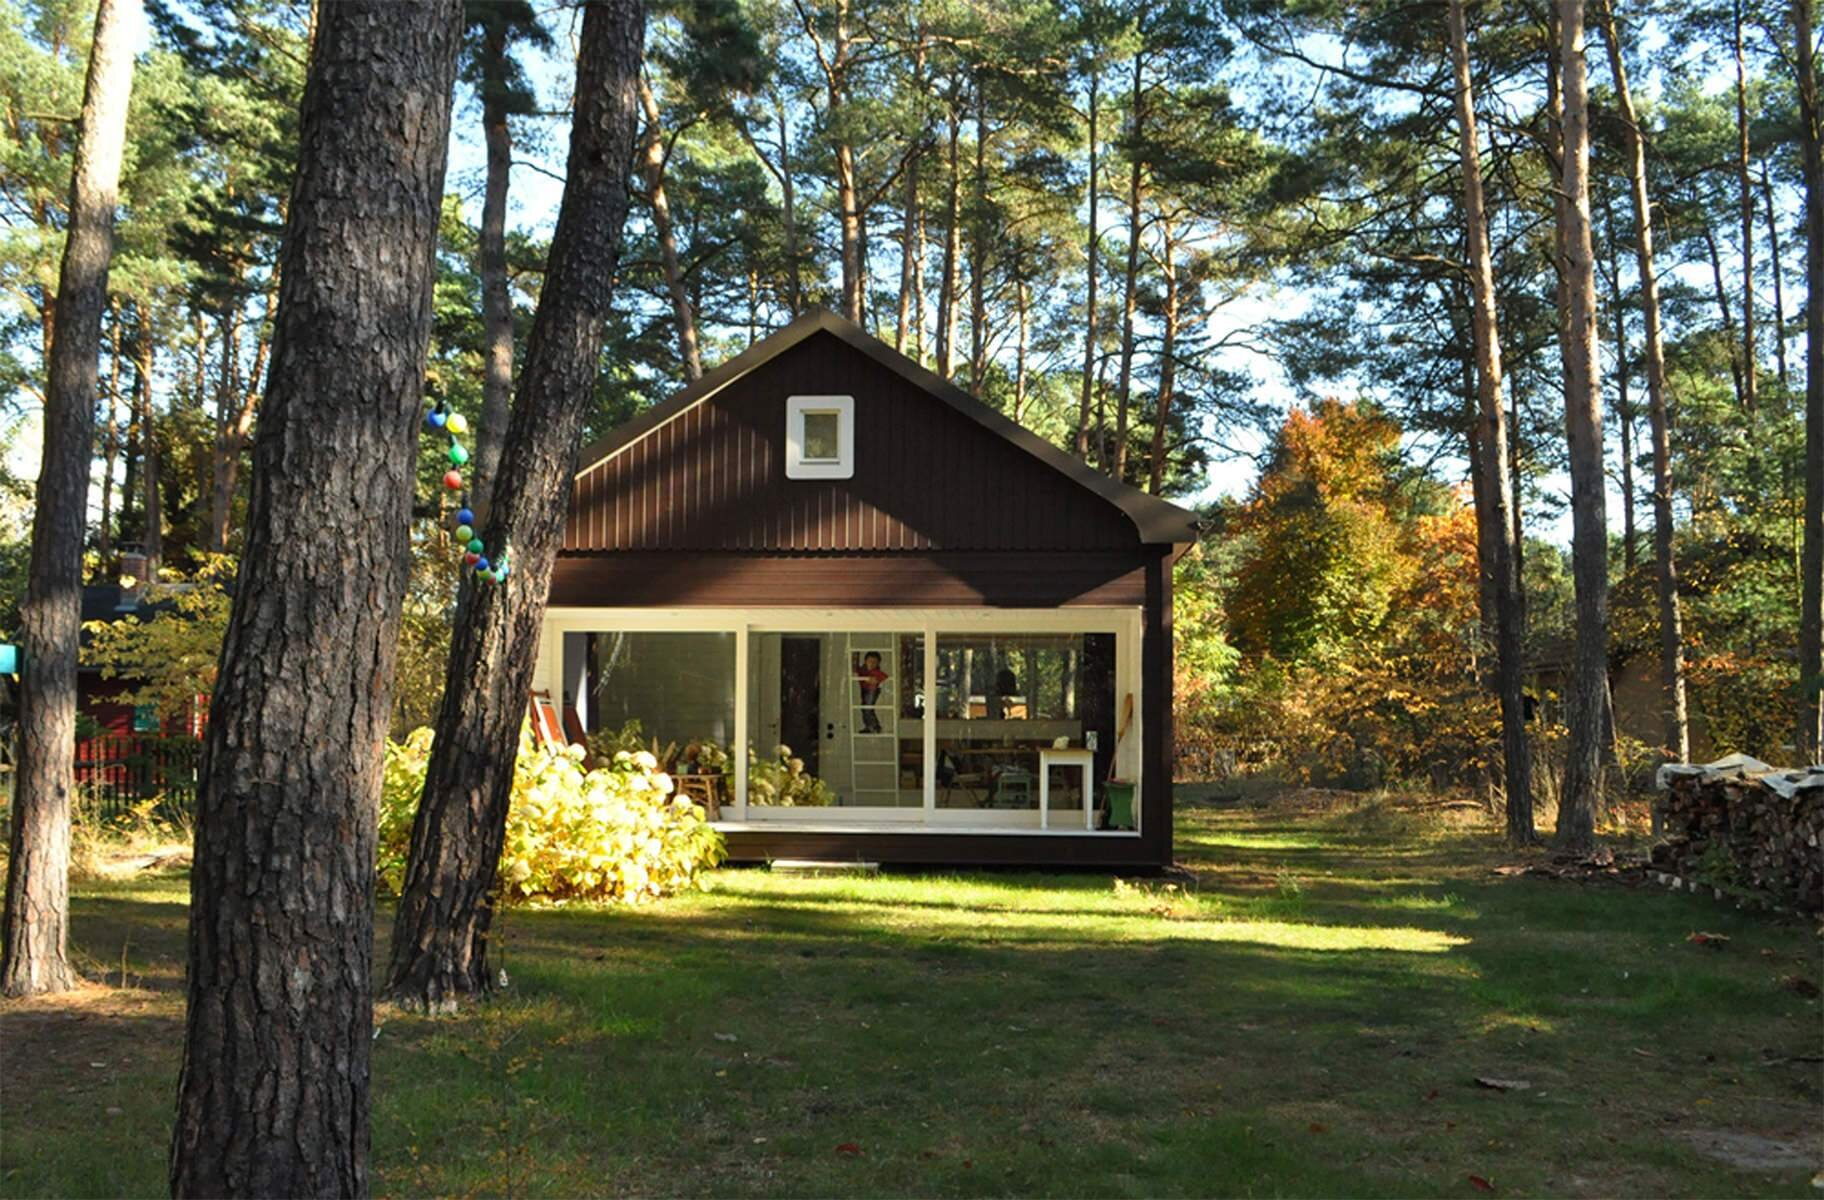 Cottage Homes Exterior Small Newlibrarygoodcom - Amazing-black-and-white-dclubcaffe-design